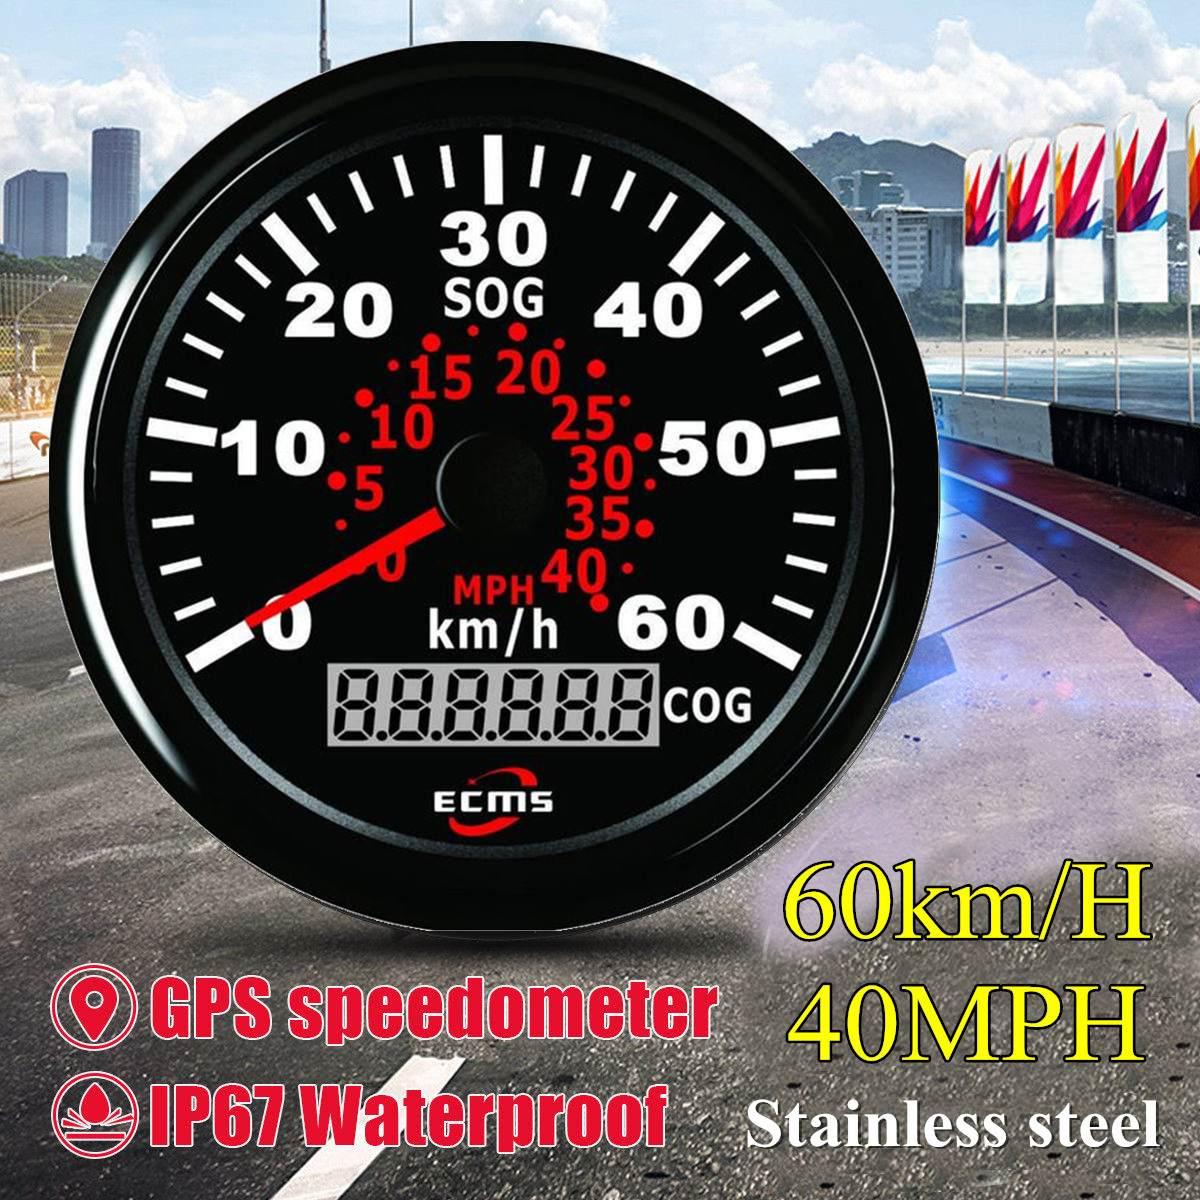 85mm Auto Car Truck Marine GPS Speedometer Waterproof Speed Sensor Meter Gauge Digital Odometer Automobiles Replacement Parts